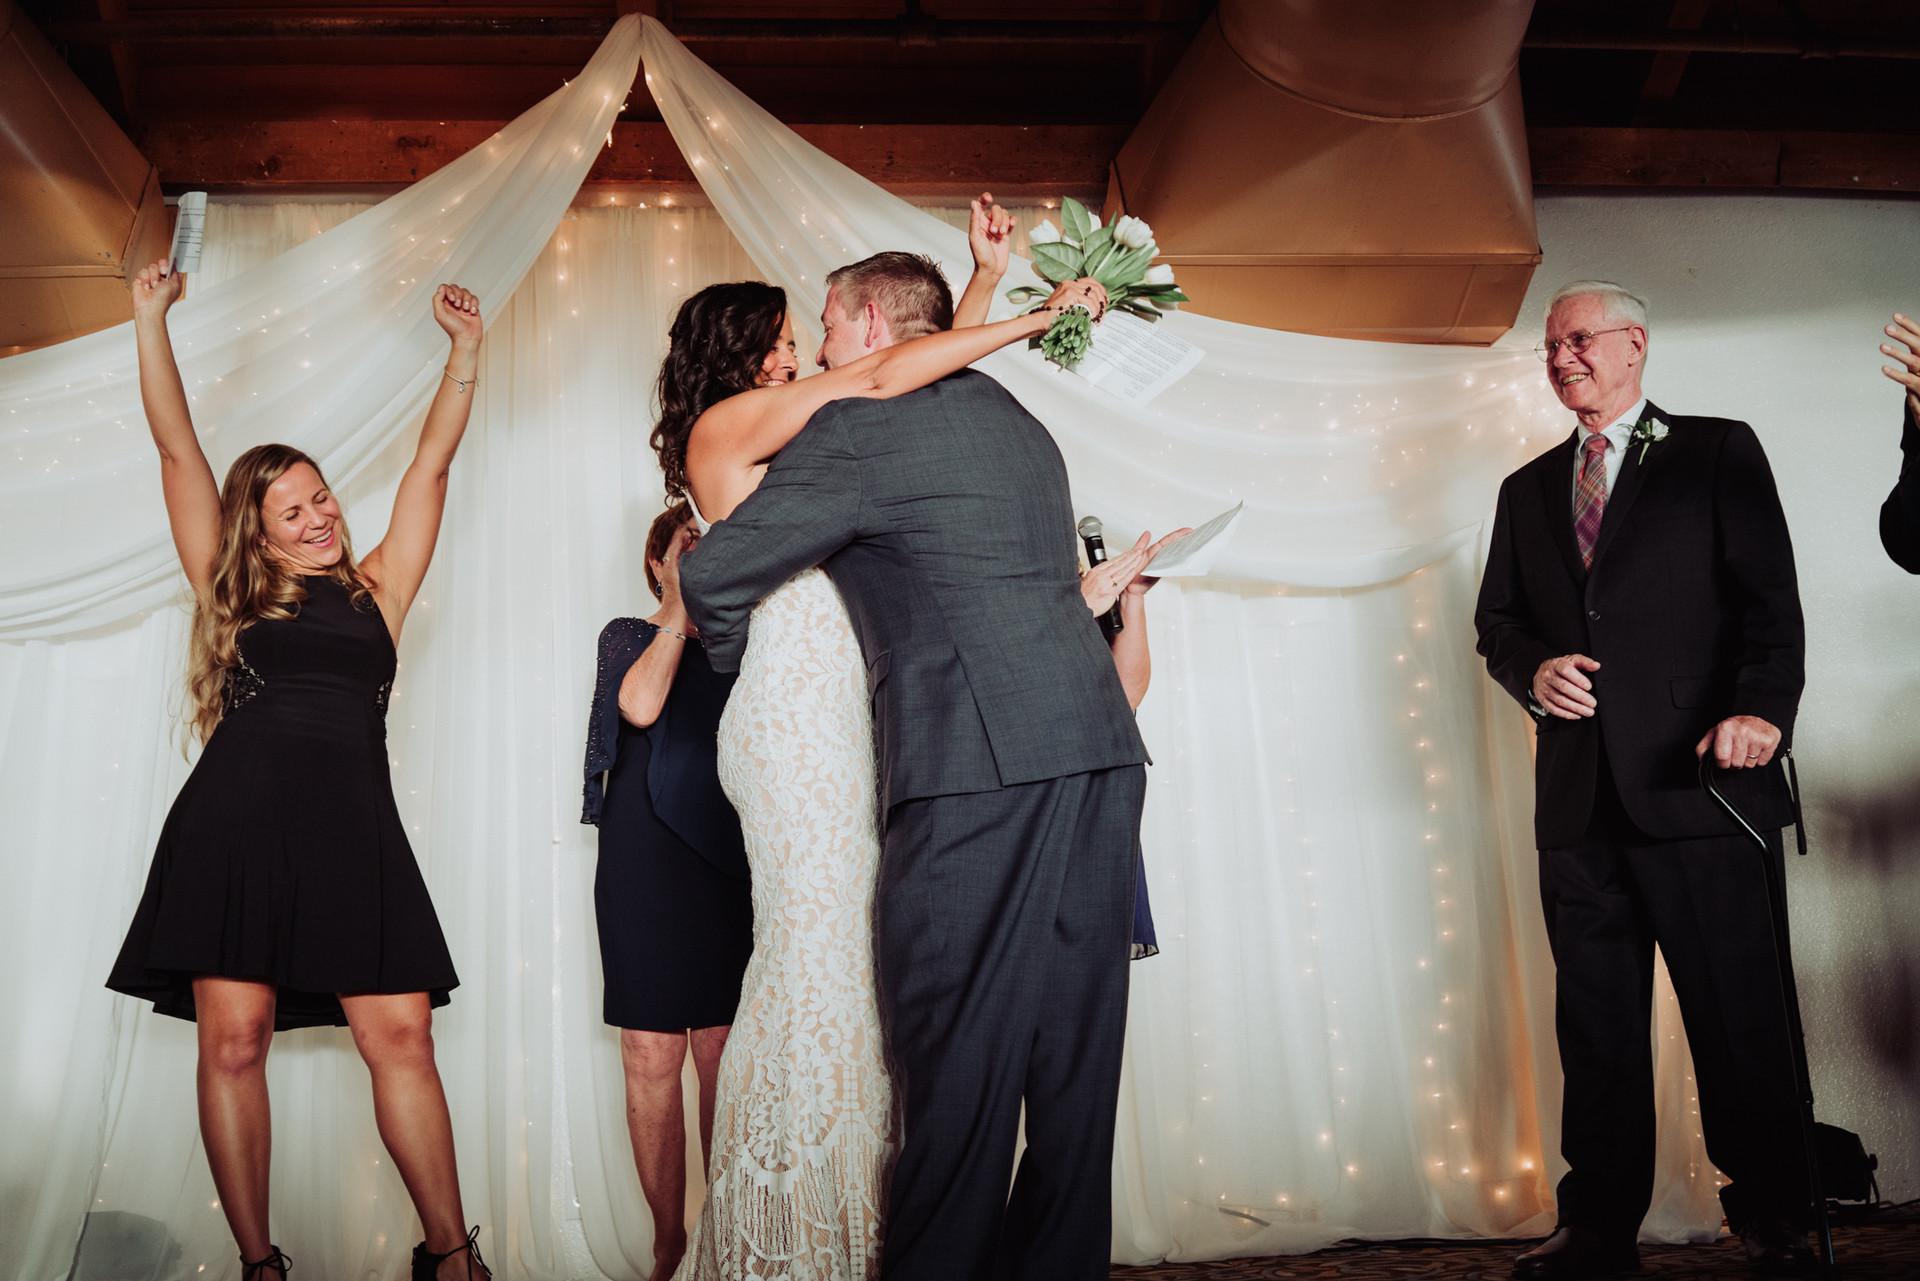 Wedding Karina and Jeff San Diego California Oct 14th 2017 Fotografo Karib Ribeiro Trancoso Arraial Dajuda